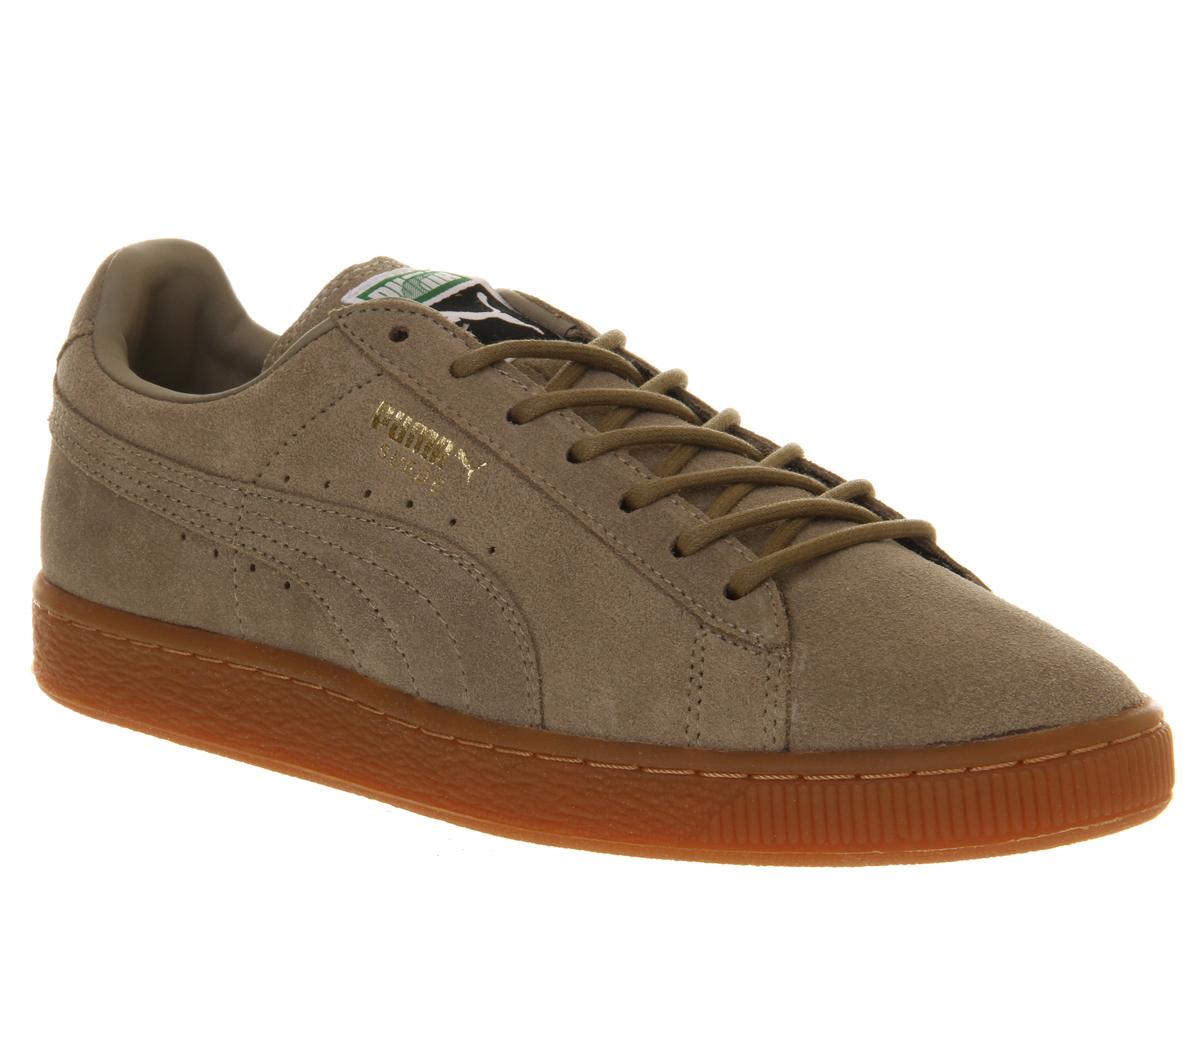 Mens-Puma-Suede-Classic-KHAKI-GUM-Trainers-Shoes